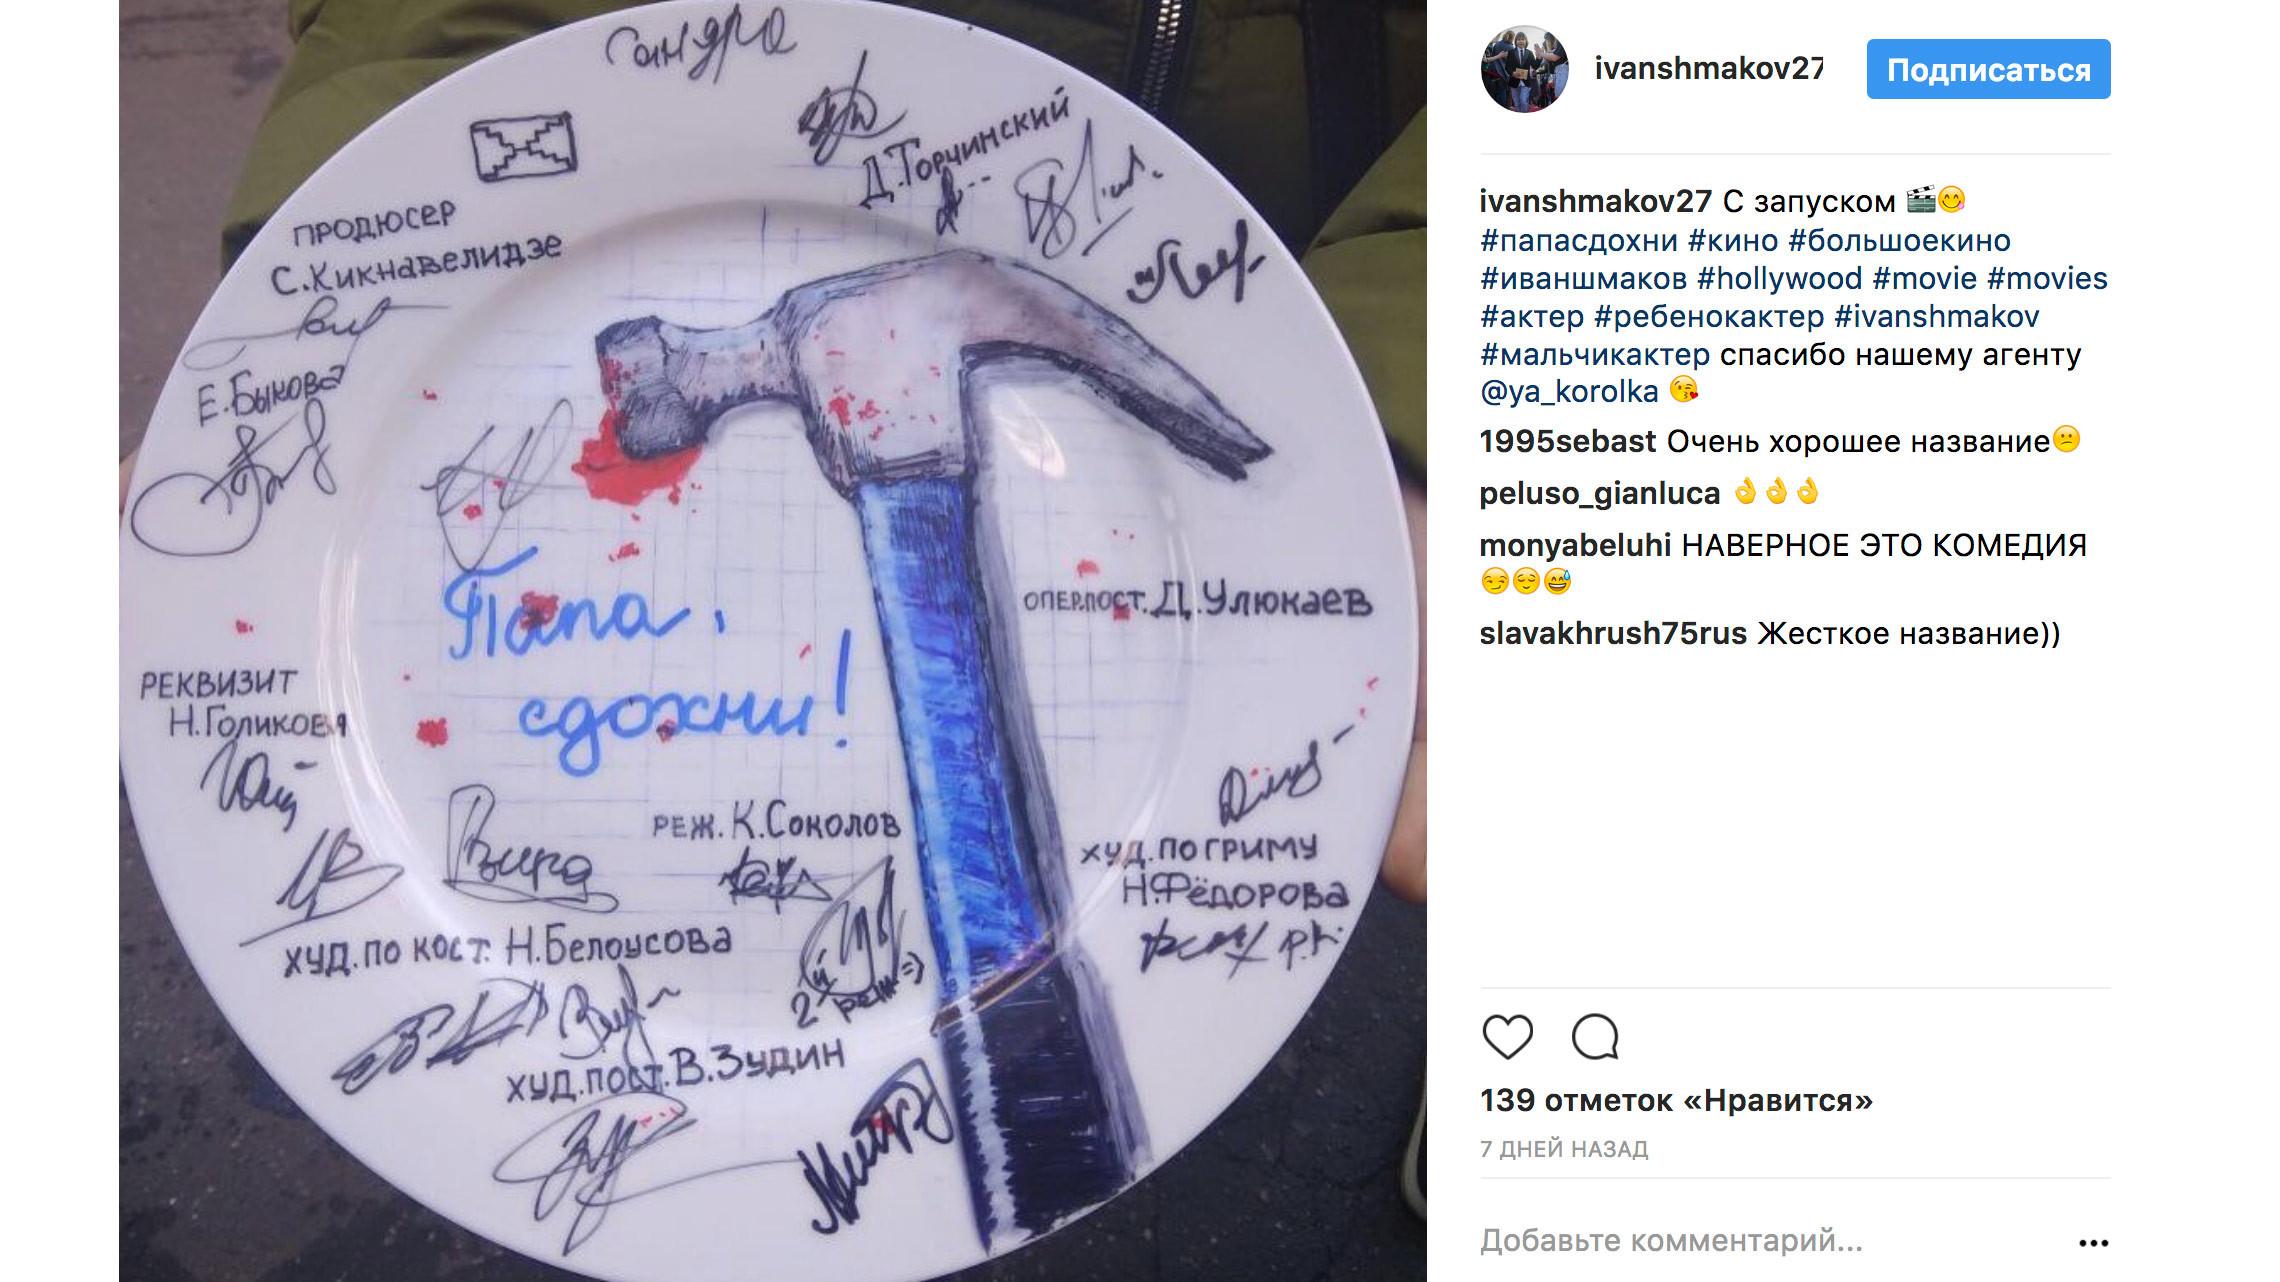 "<p>Скриншот страницы Instagram/<a href=""https://www.instagram.com/ivanshmakov27/"" title=""ivanshmakov27"">ivanshmakov27</a></p>"